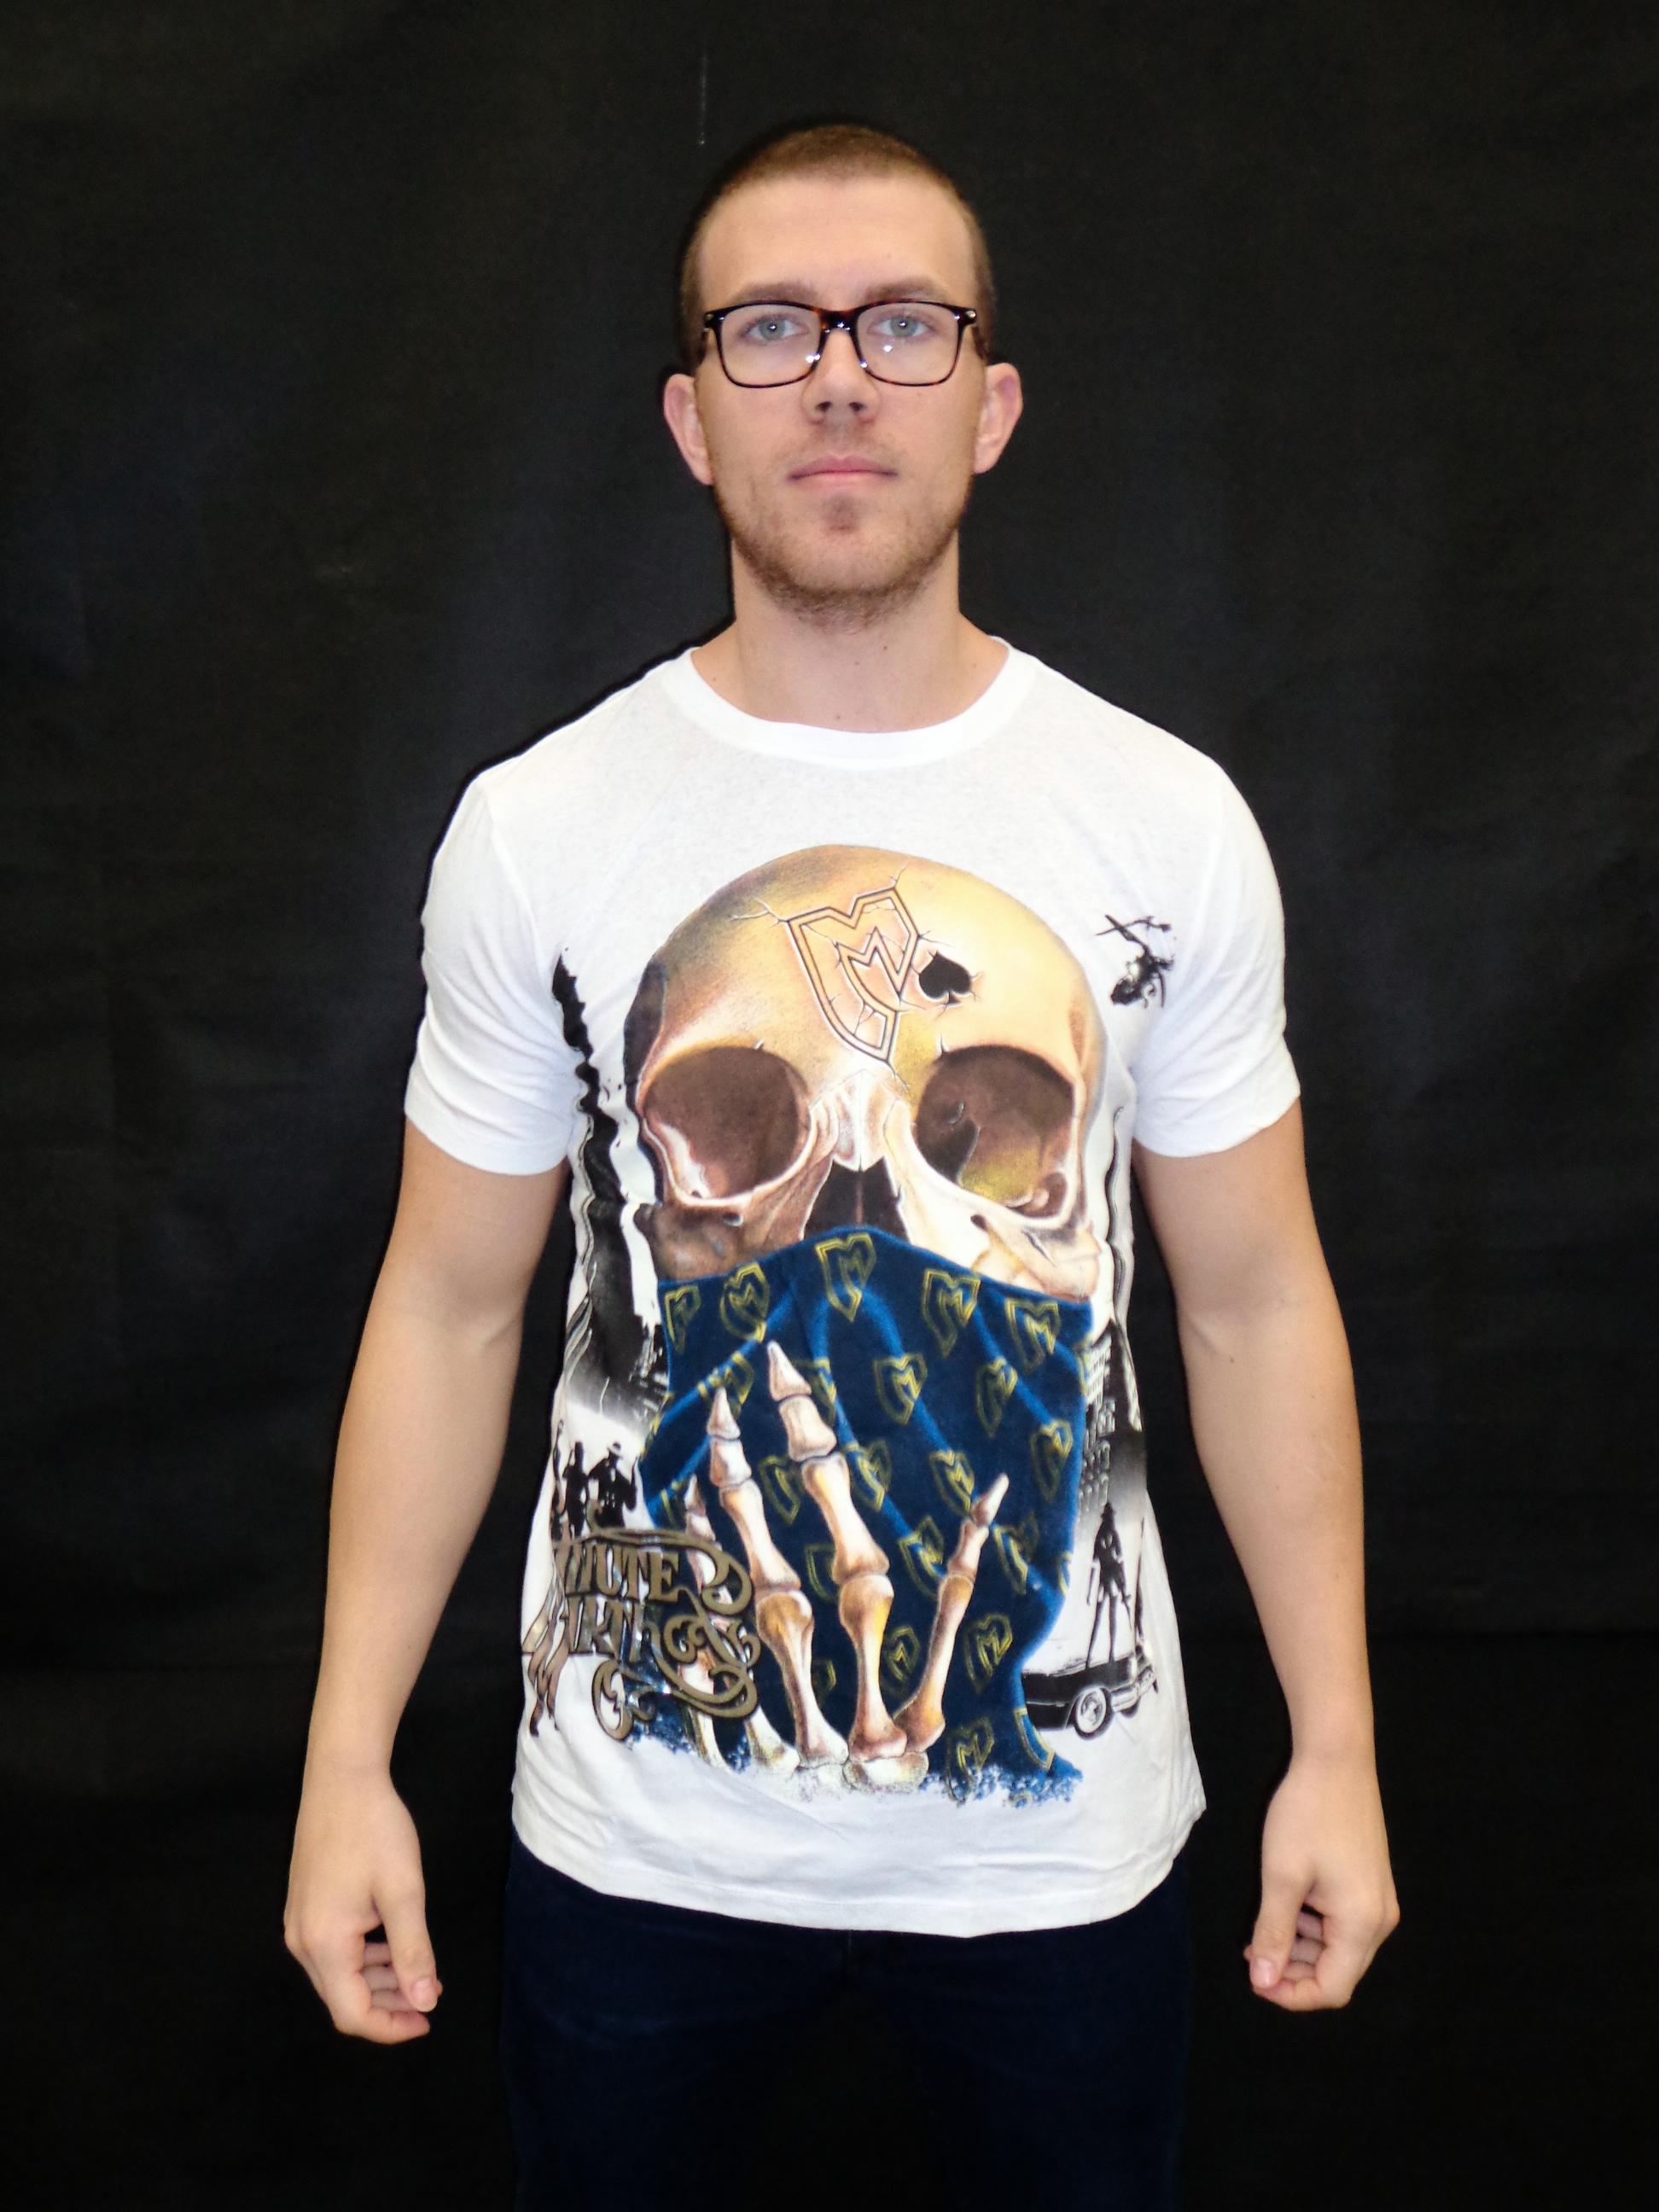 the_bandit_t_shirt_unisex__t_shirts_6.jpg